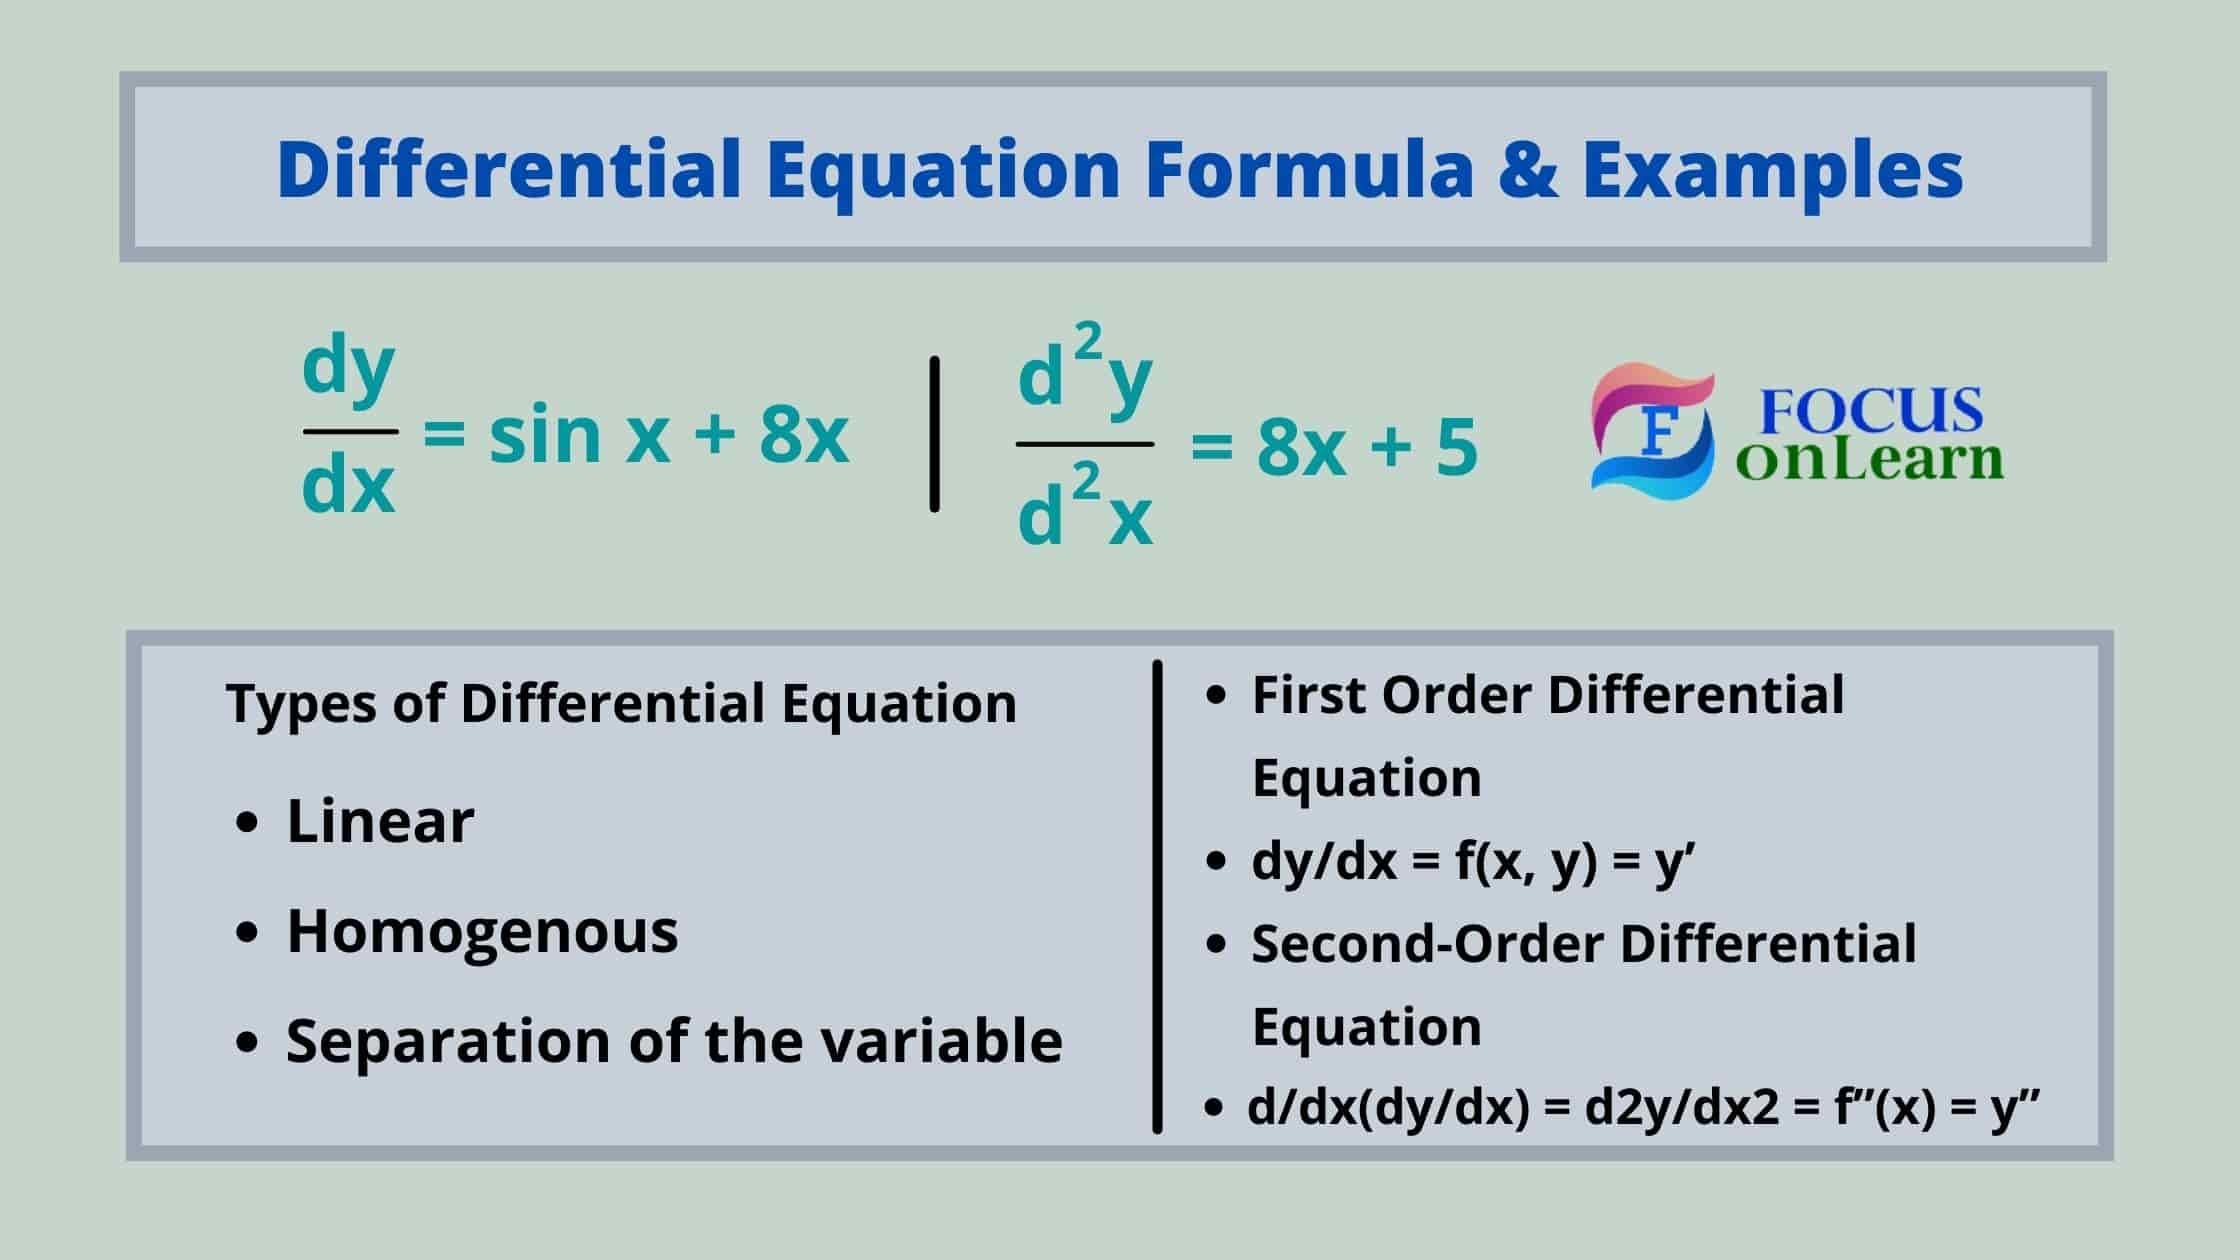 Differential Equation Formula